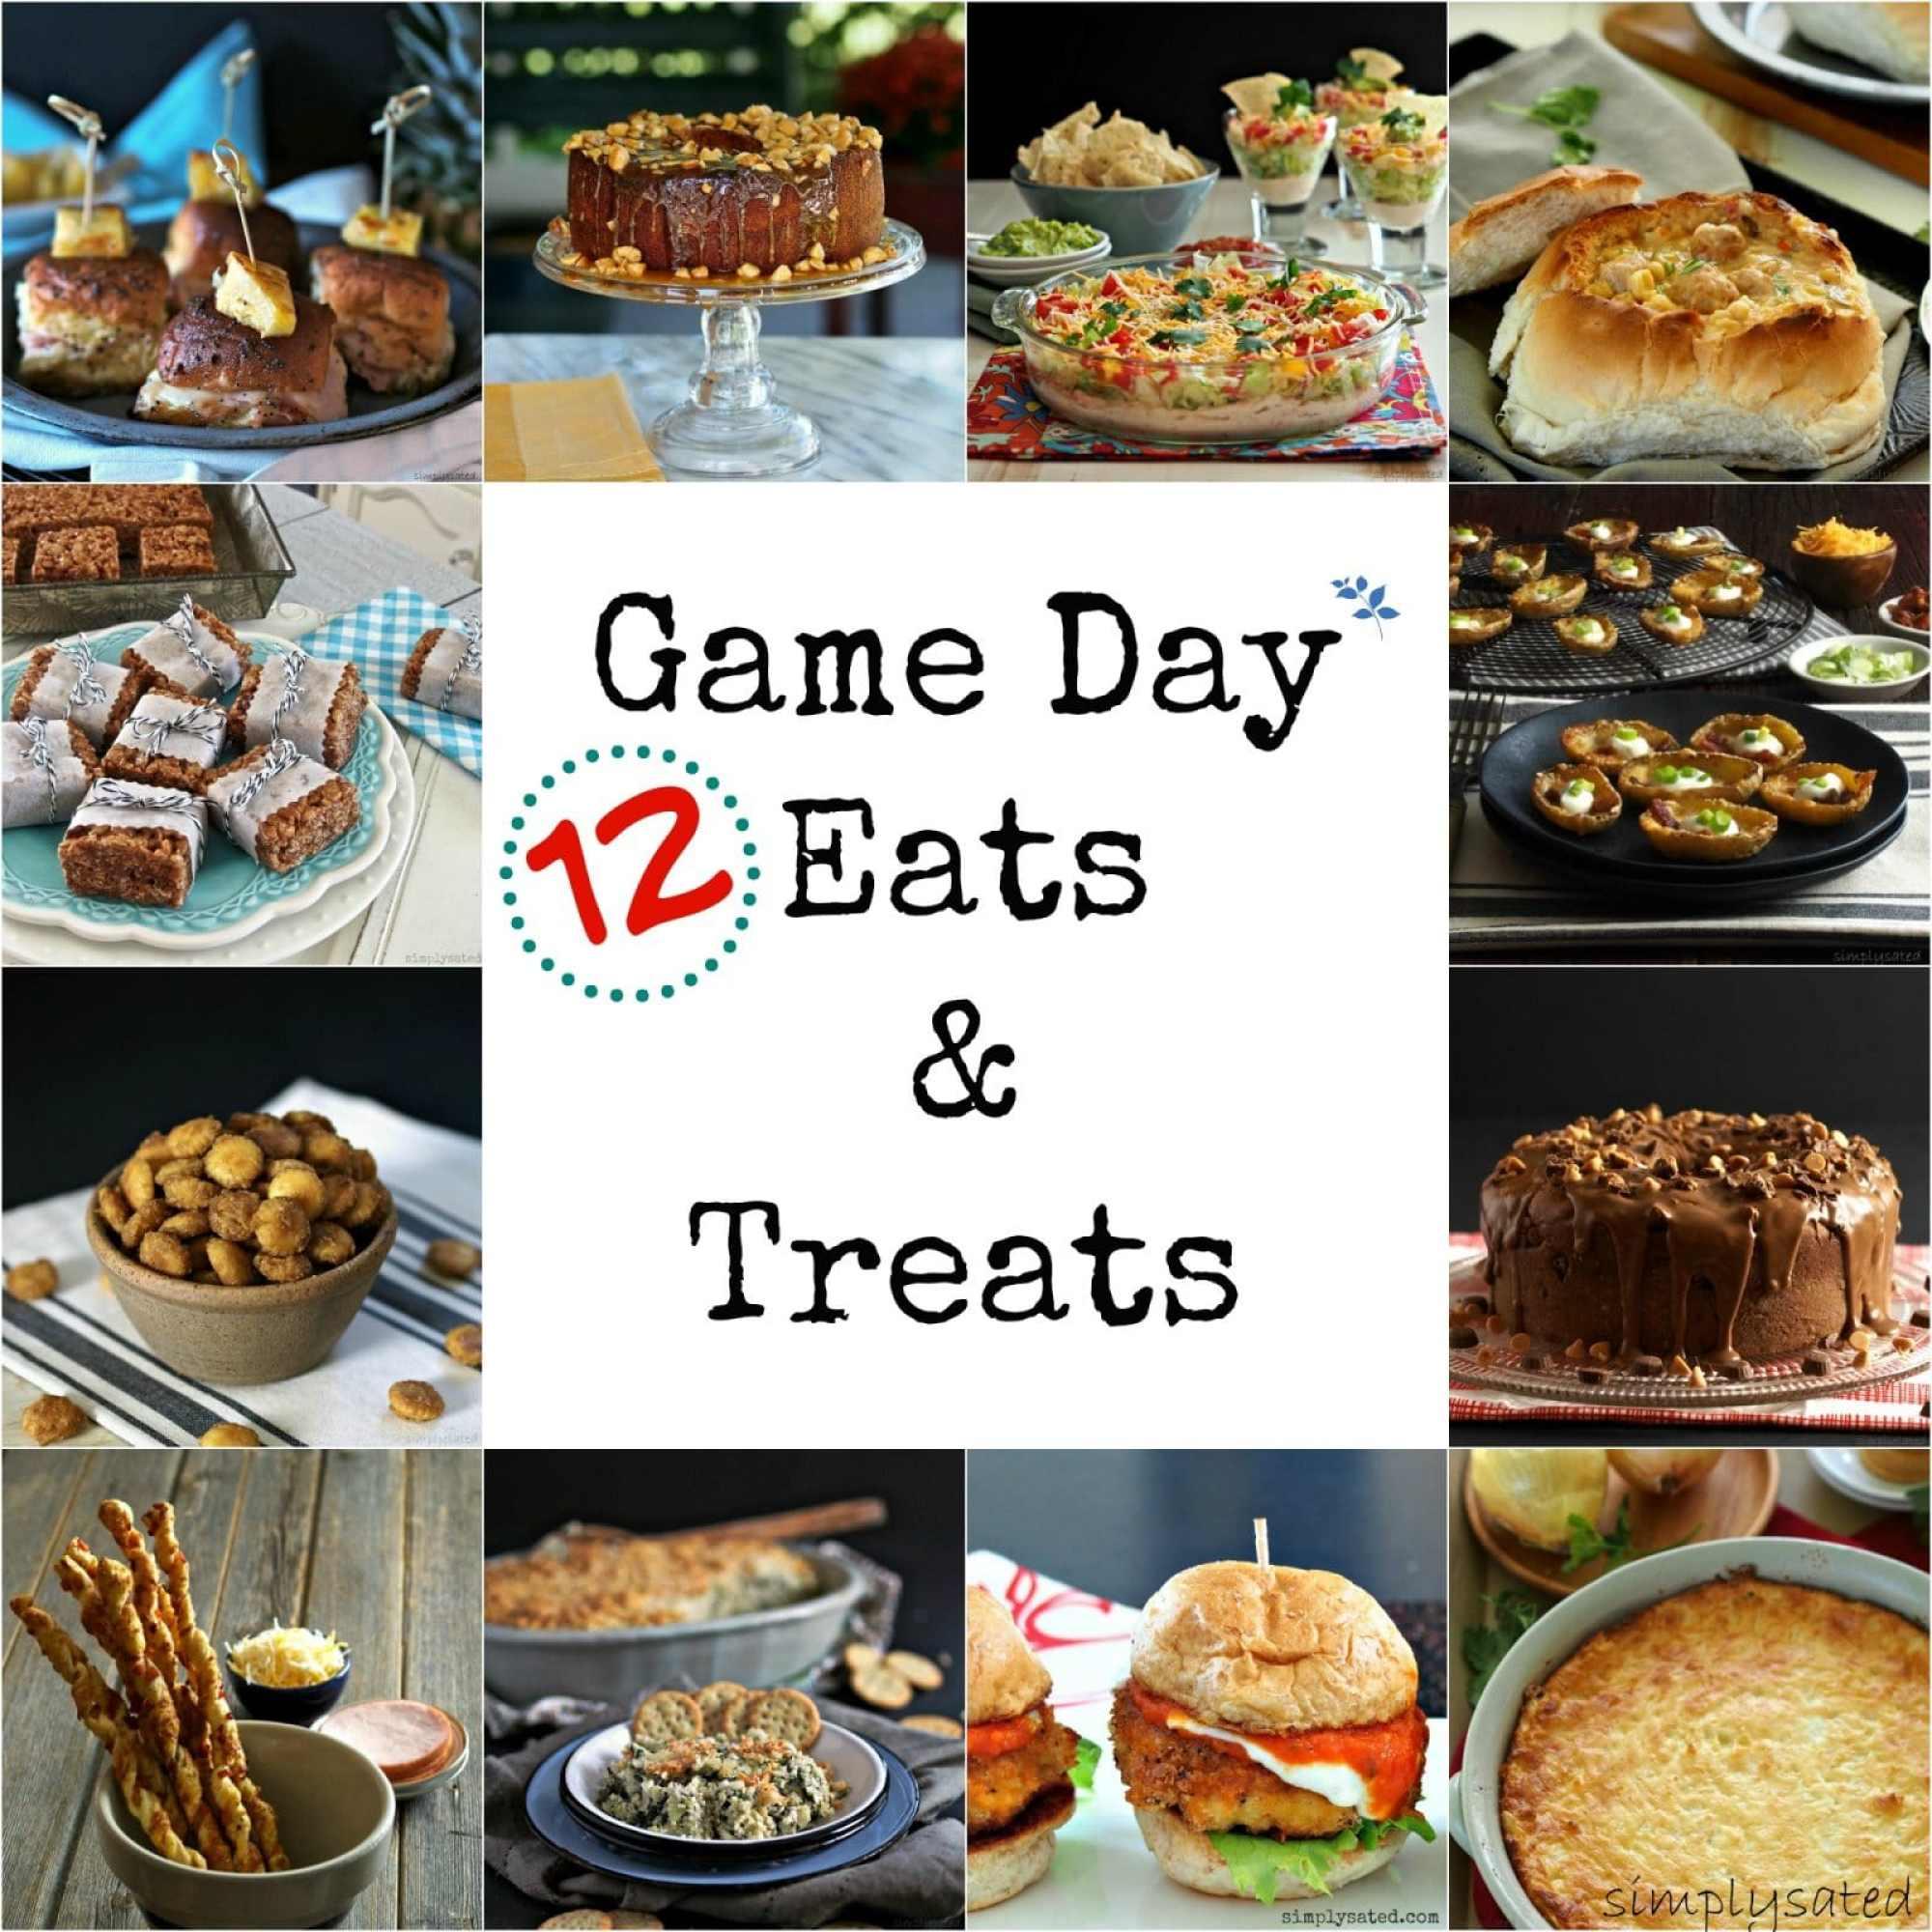 Game Day Eats & Treats